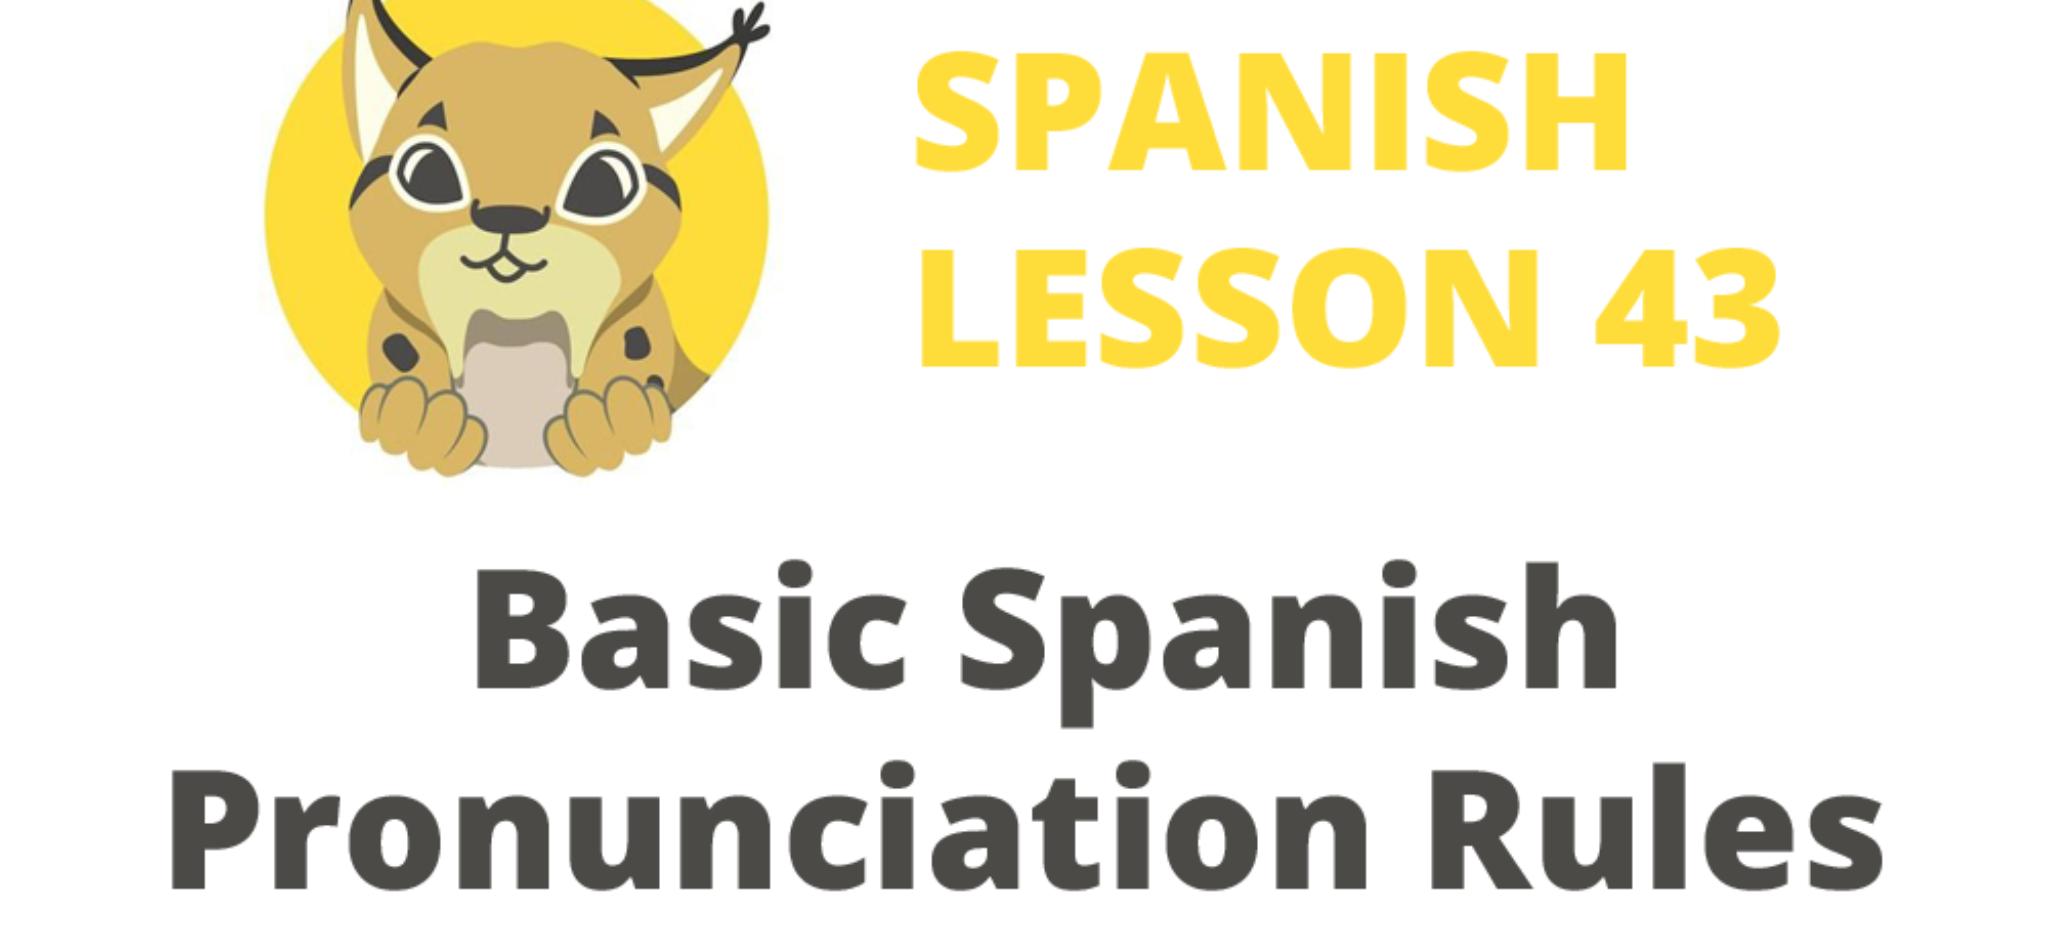 spanish pronunciation rules lesson 43